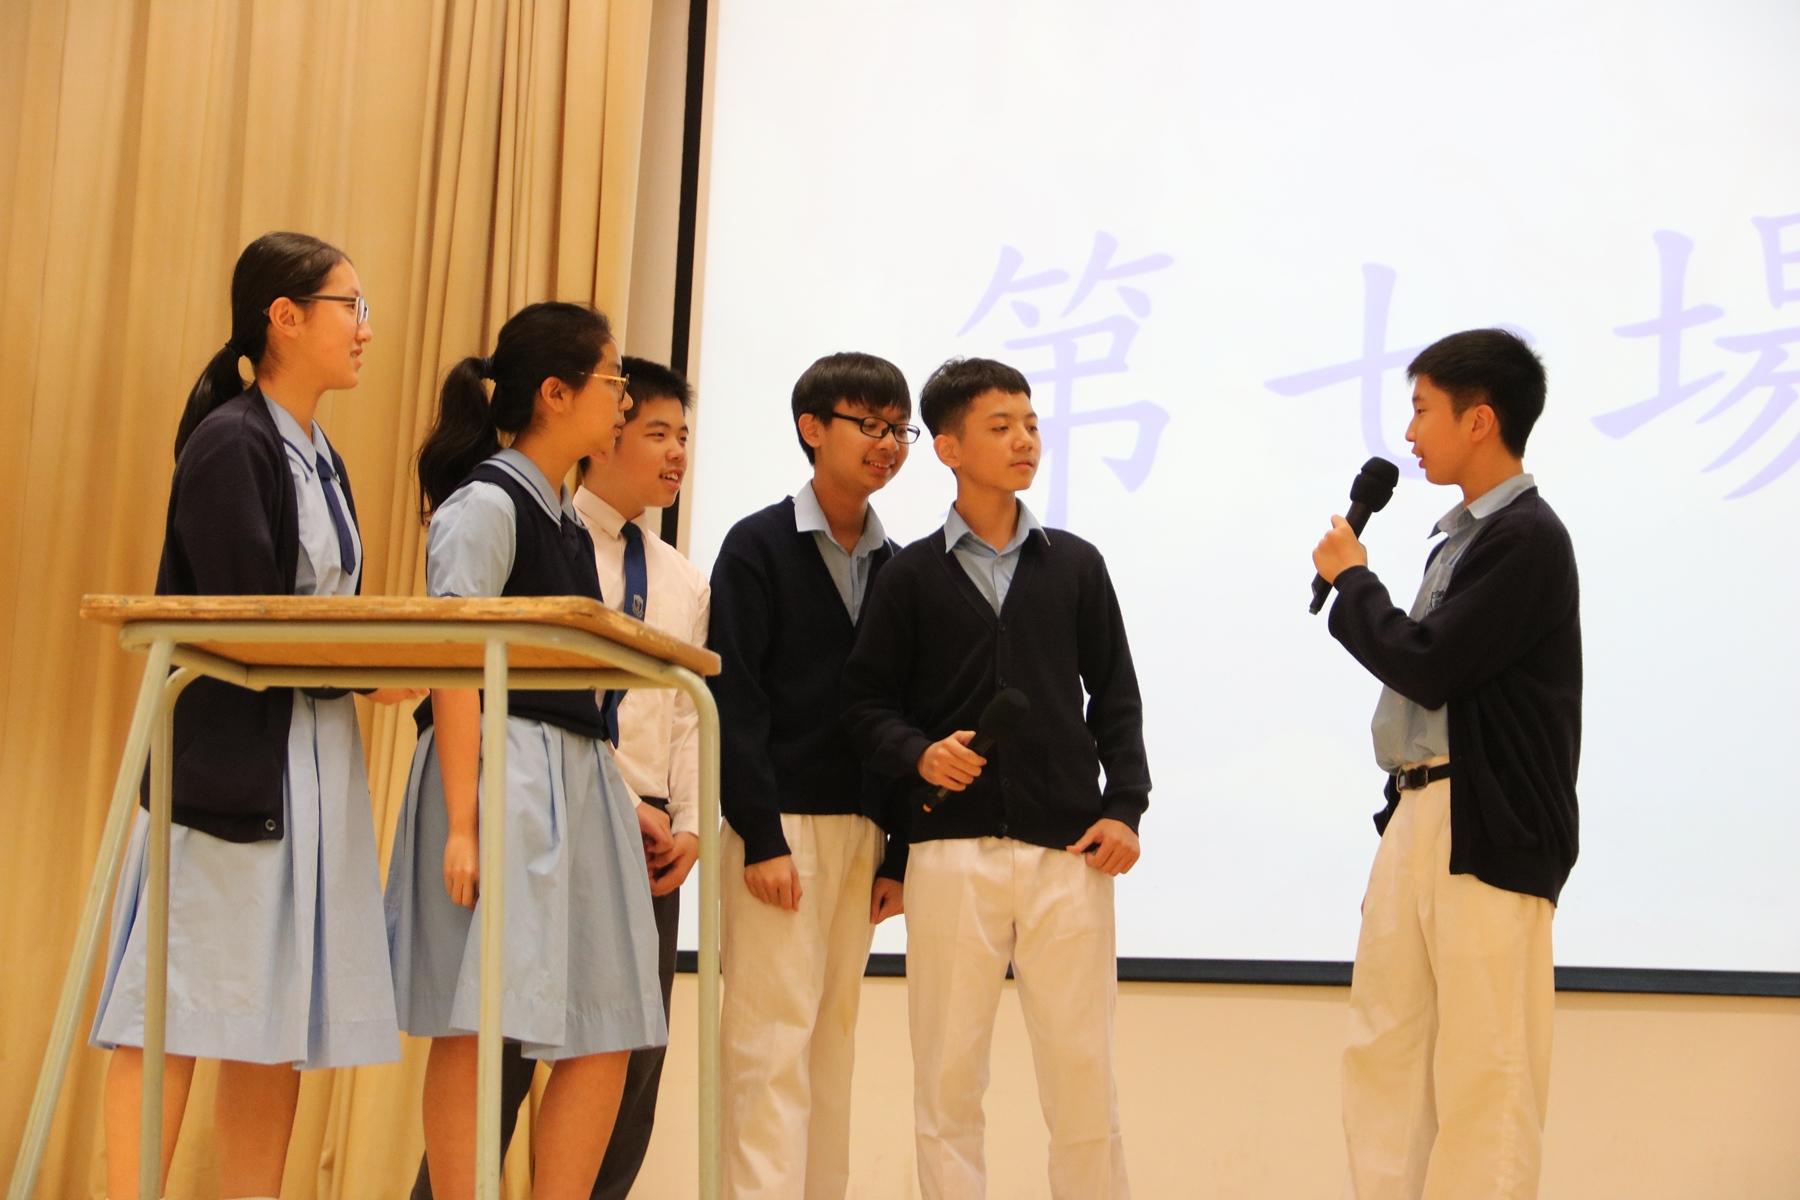 http://npc.edu.hk/sites/default/files/img_3990.jpg